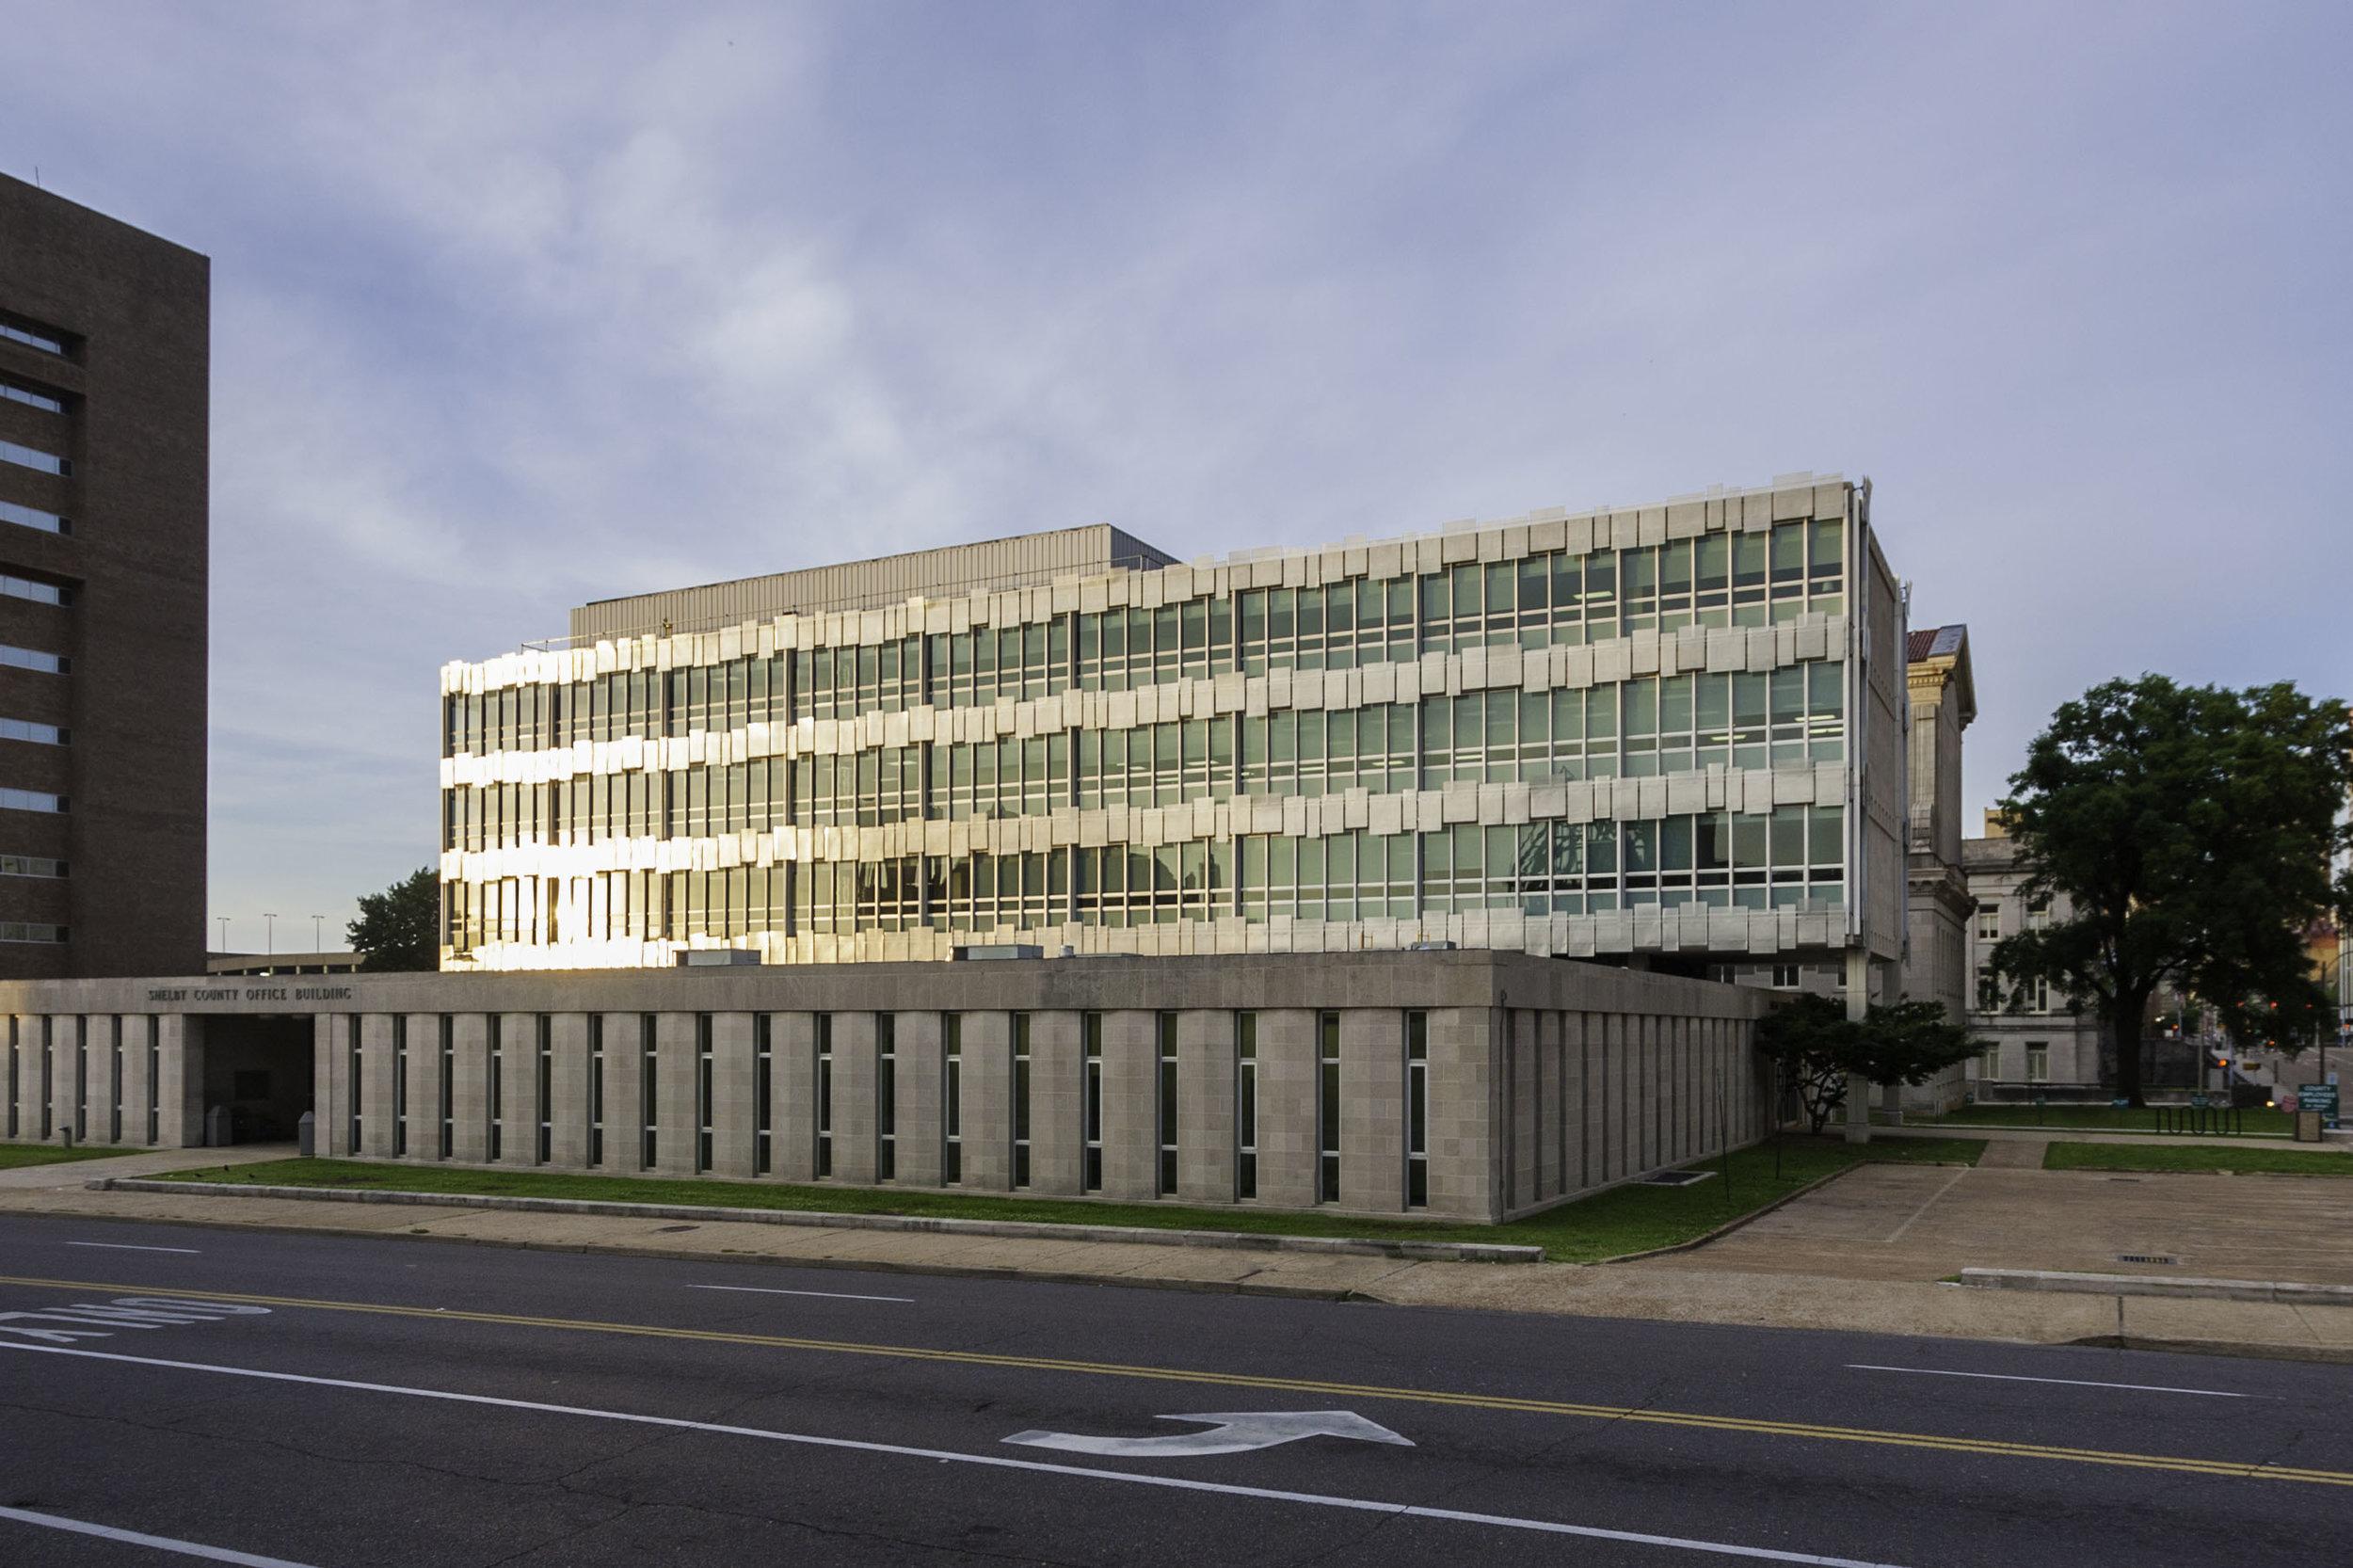 Shelby County Jury Building Facade Improvements